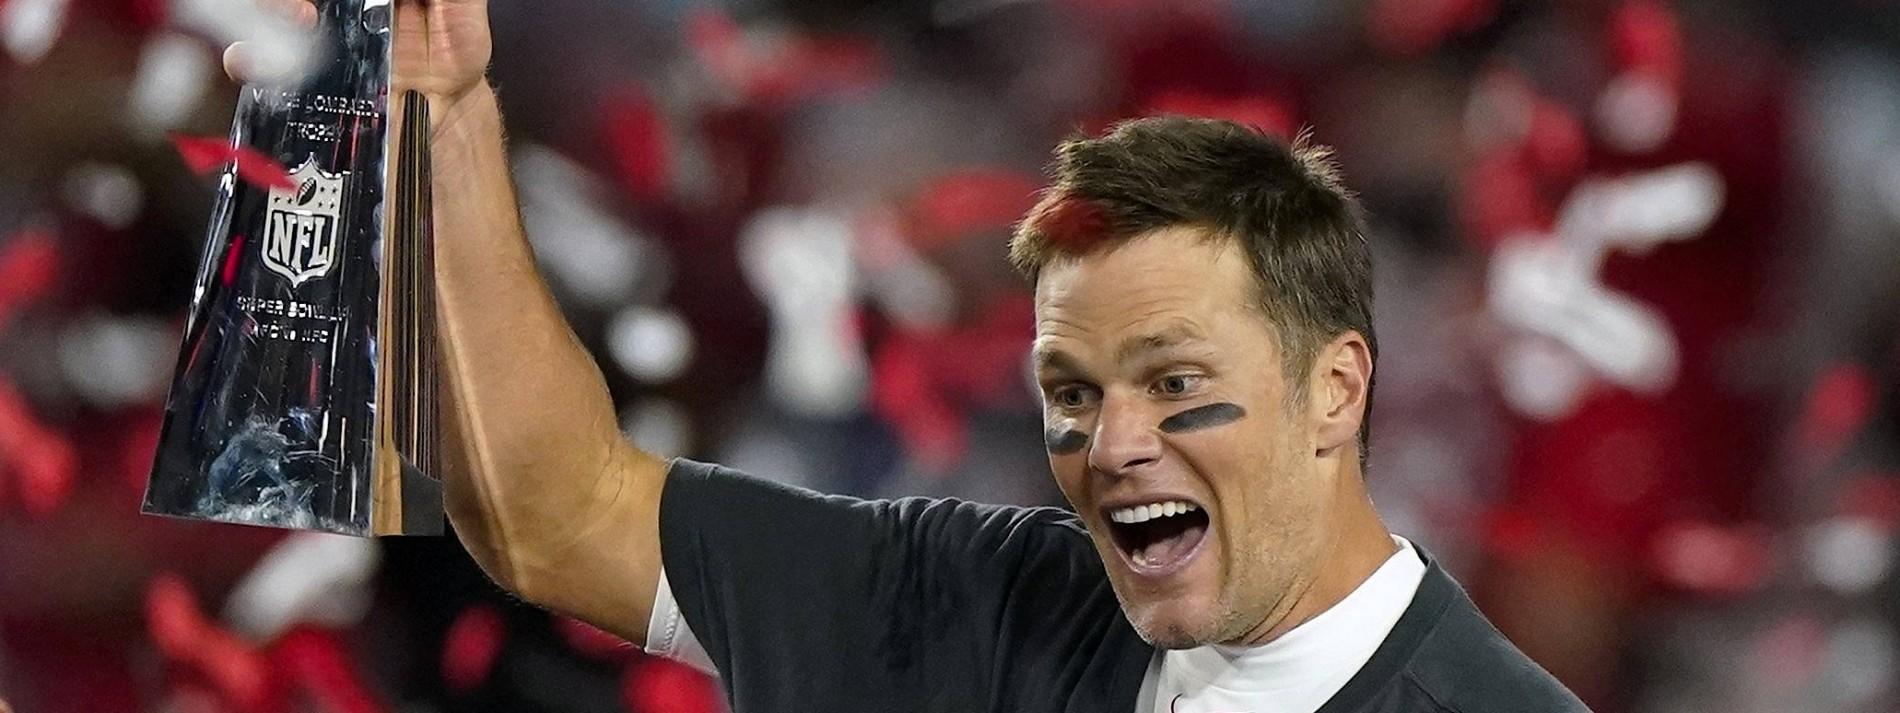 Tom Brady ist noch lange nicht fertig